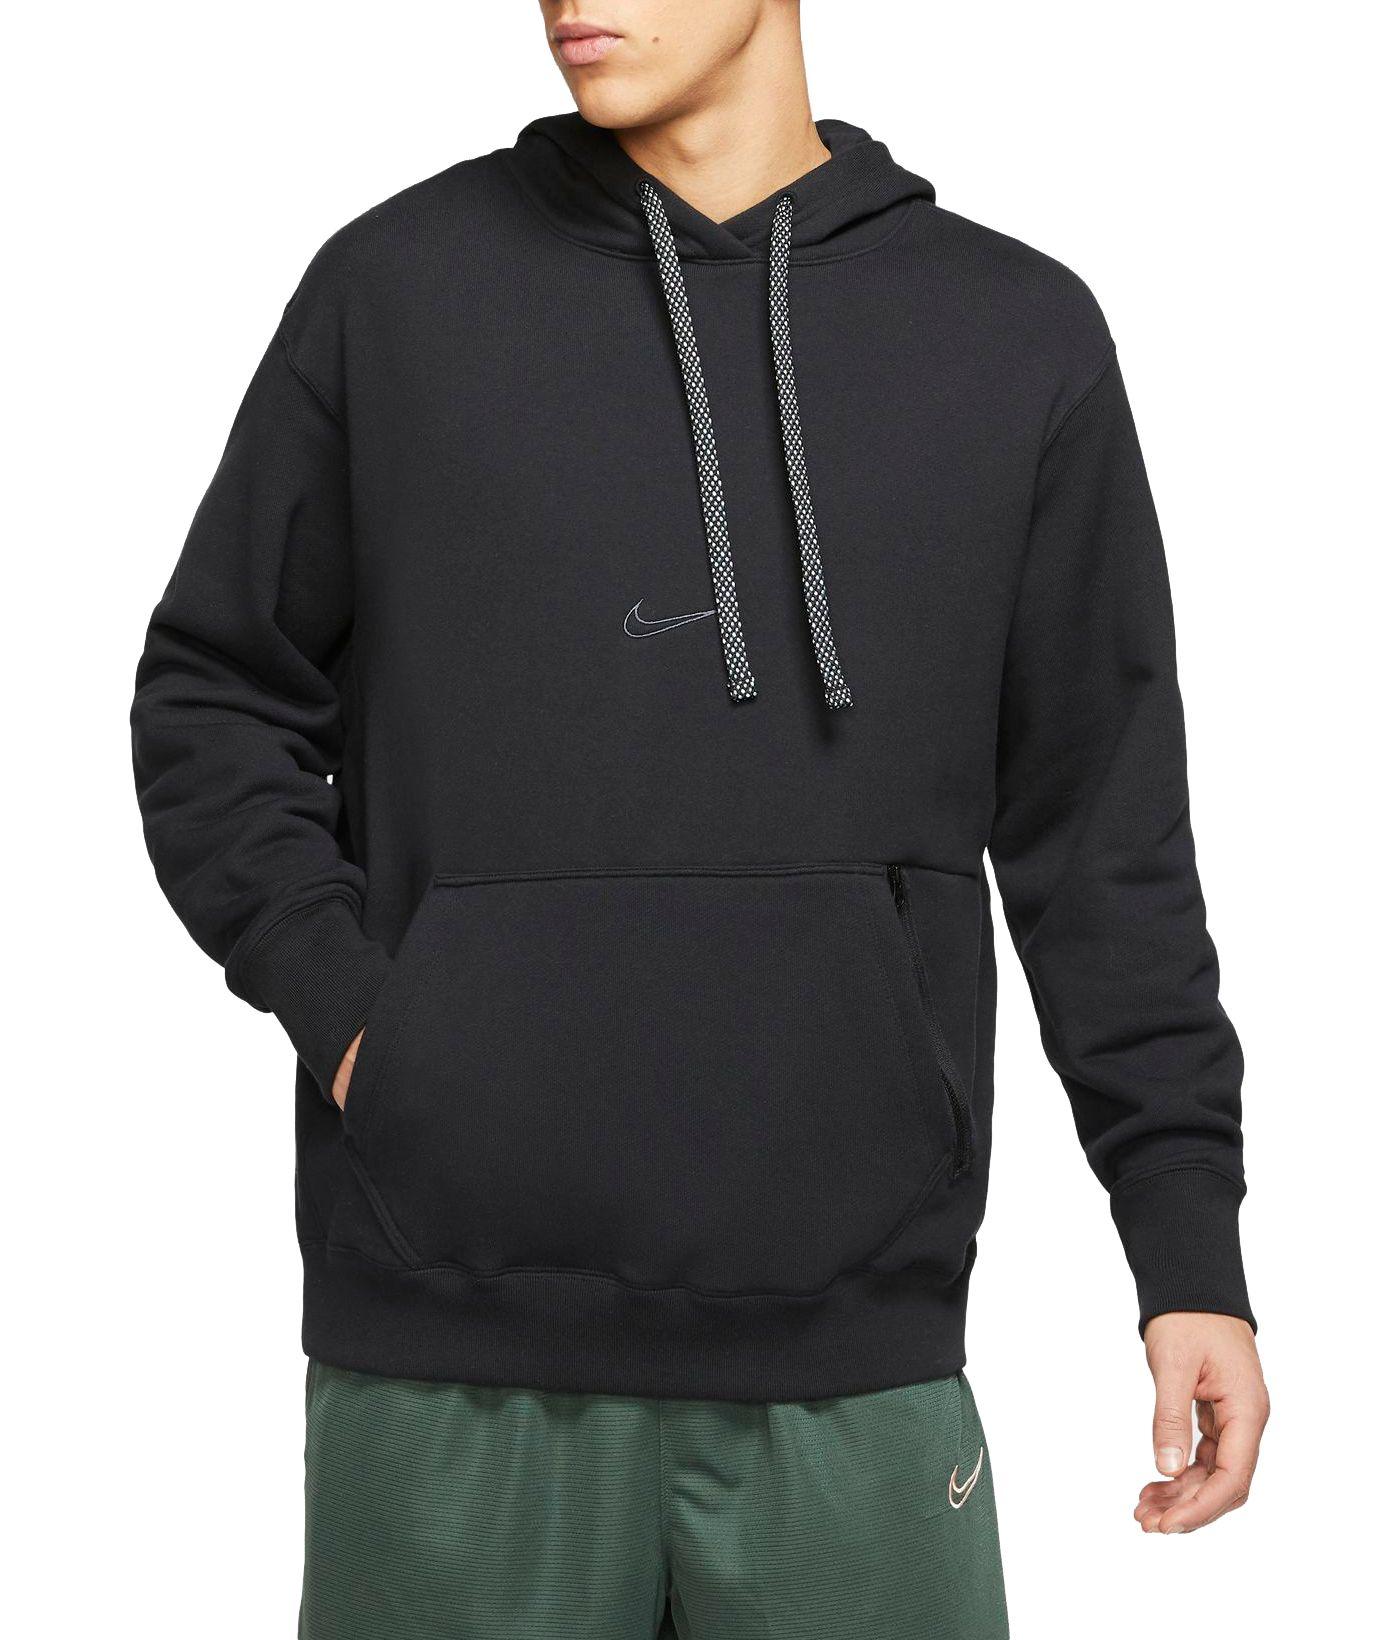 Nike Men's DNA Basketball Hoodie